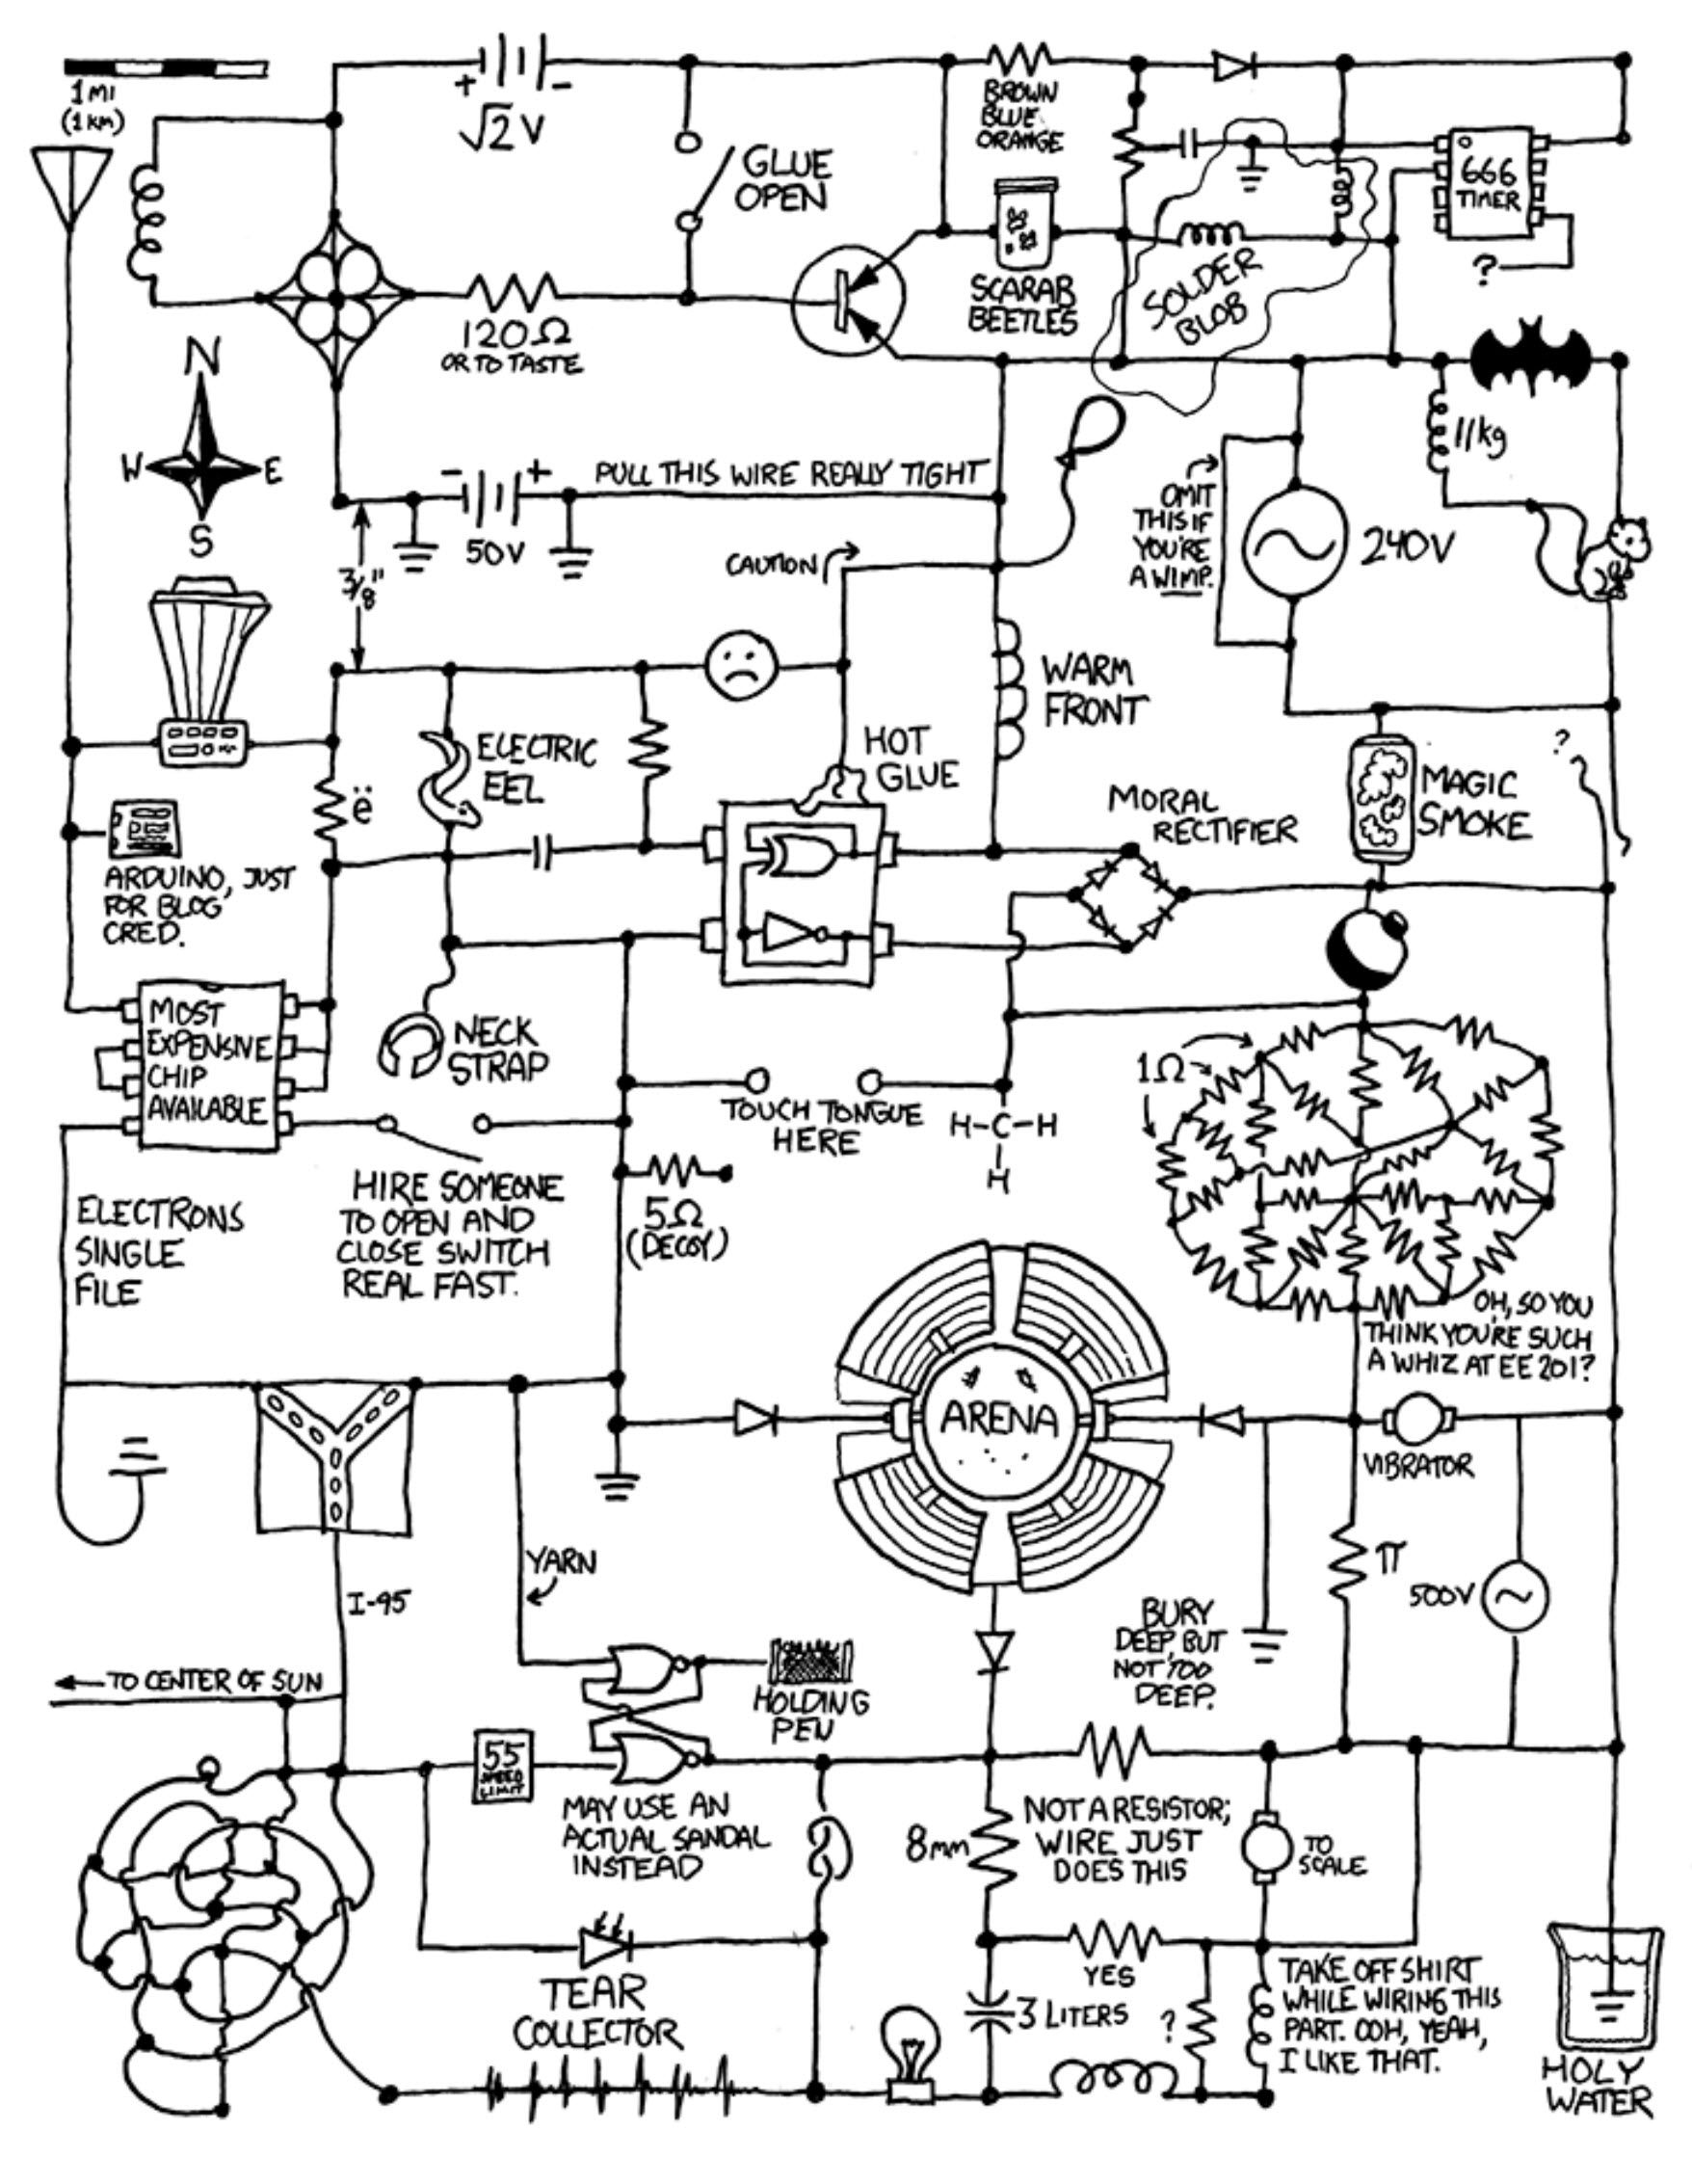 small resolution of xkcd com circuit diagram lol stuff i like pinterest circuit rh pinterest com 120v electrical switch